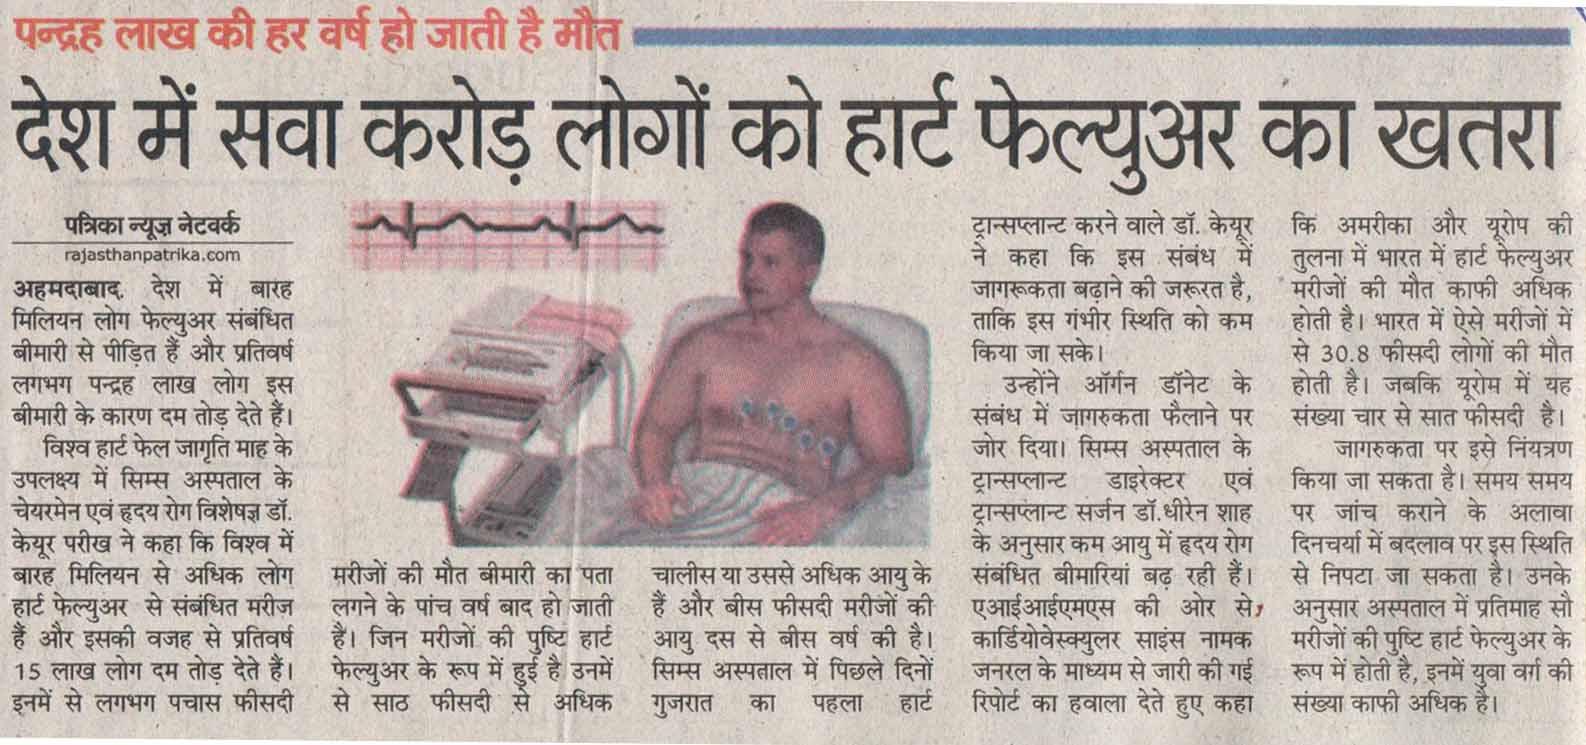 Rajasthan Patrika_Ahm_Heart Failure_20.05.17_Pg.03